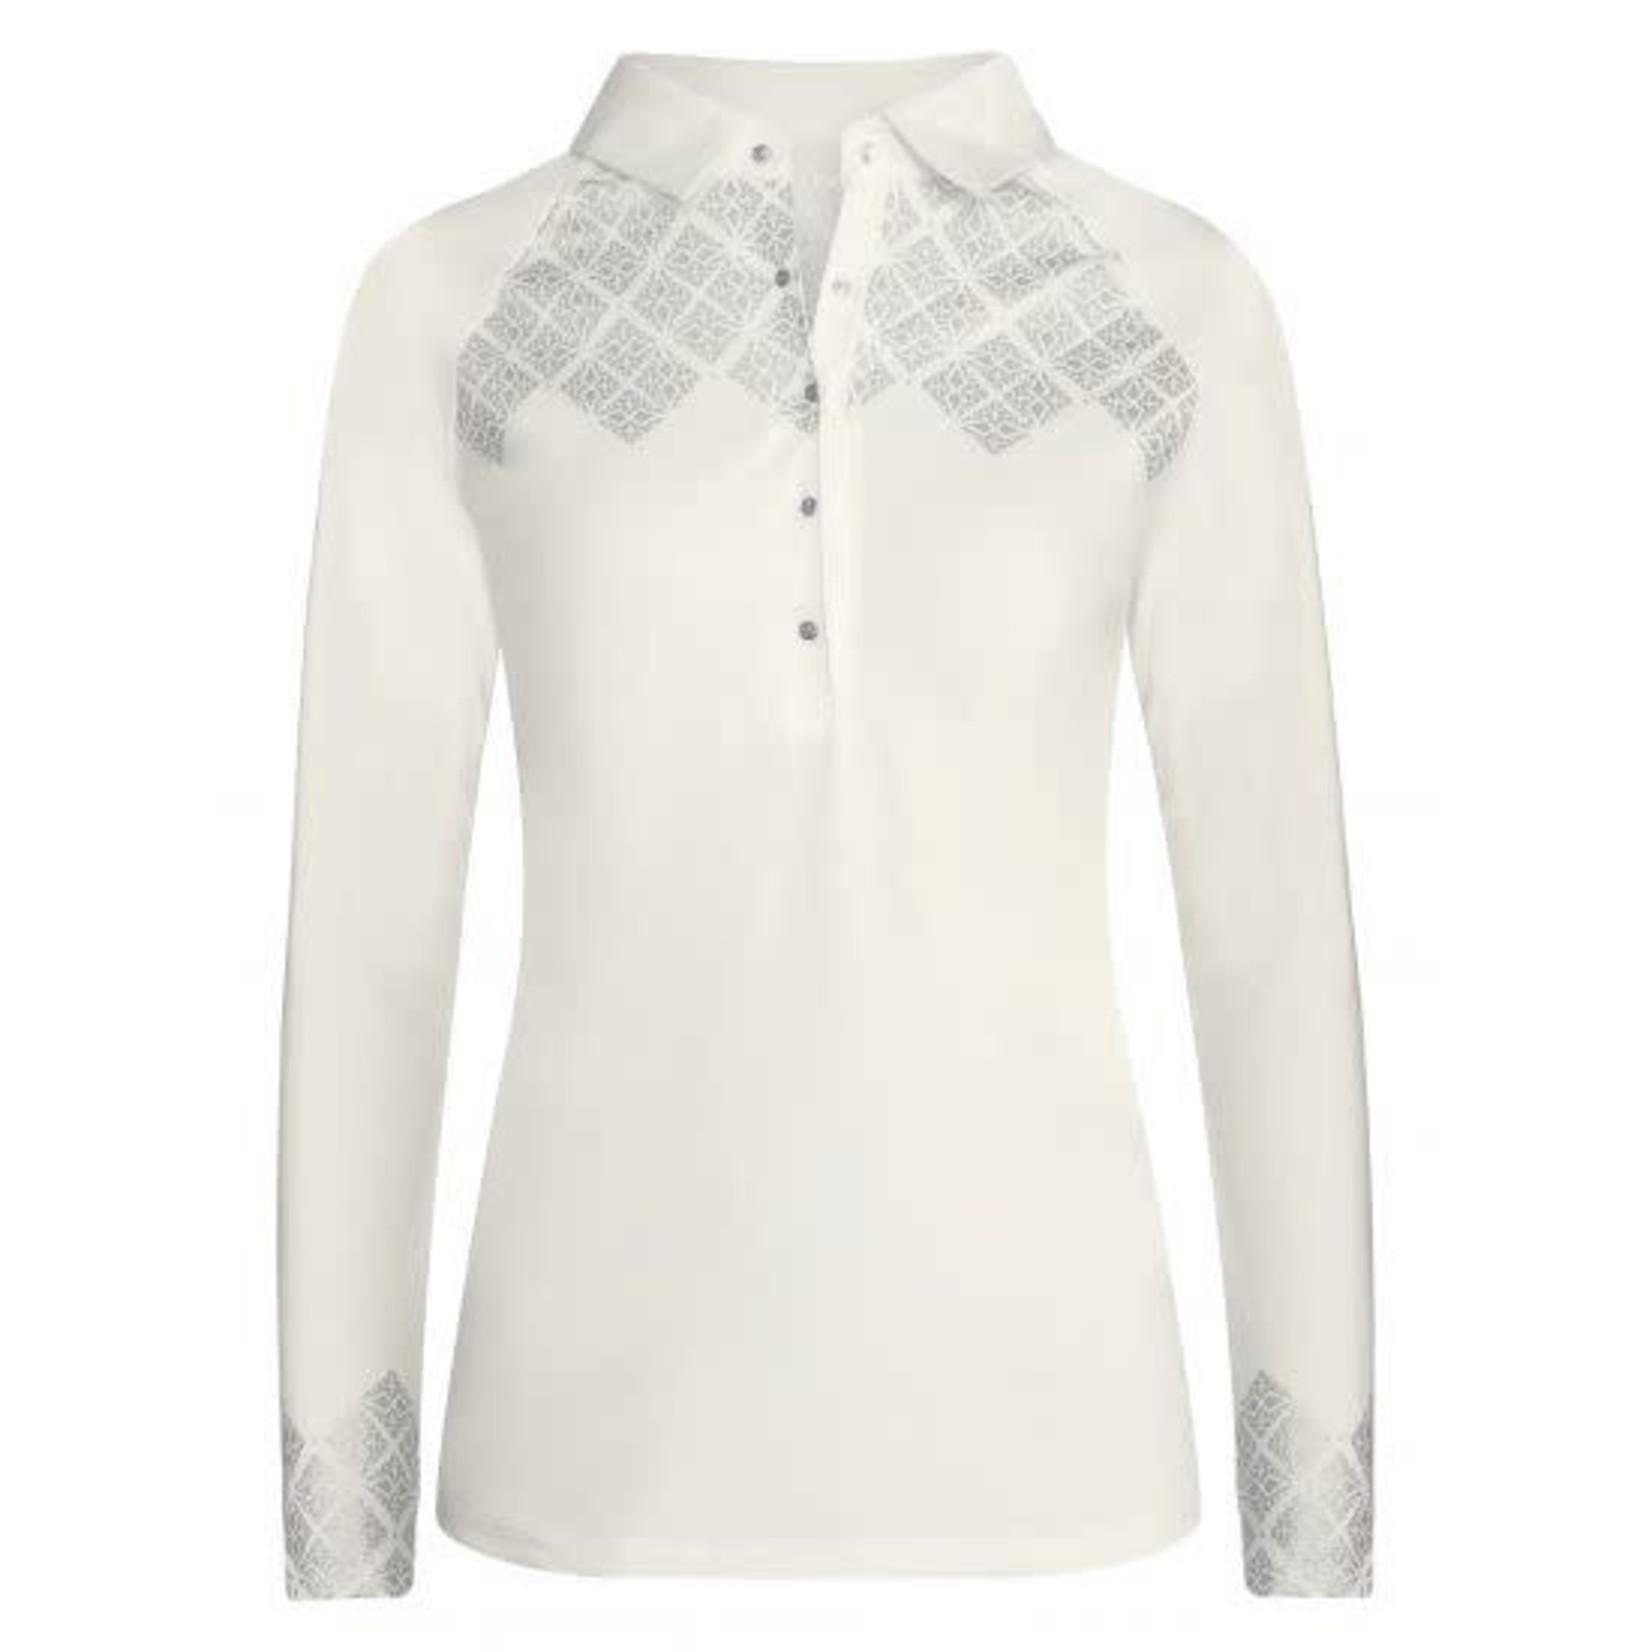 Rohnisch Rohnisch Tina Ls Poloshirt